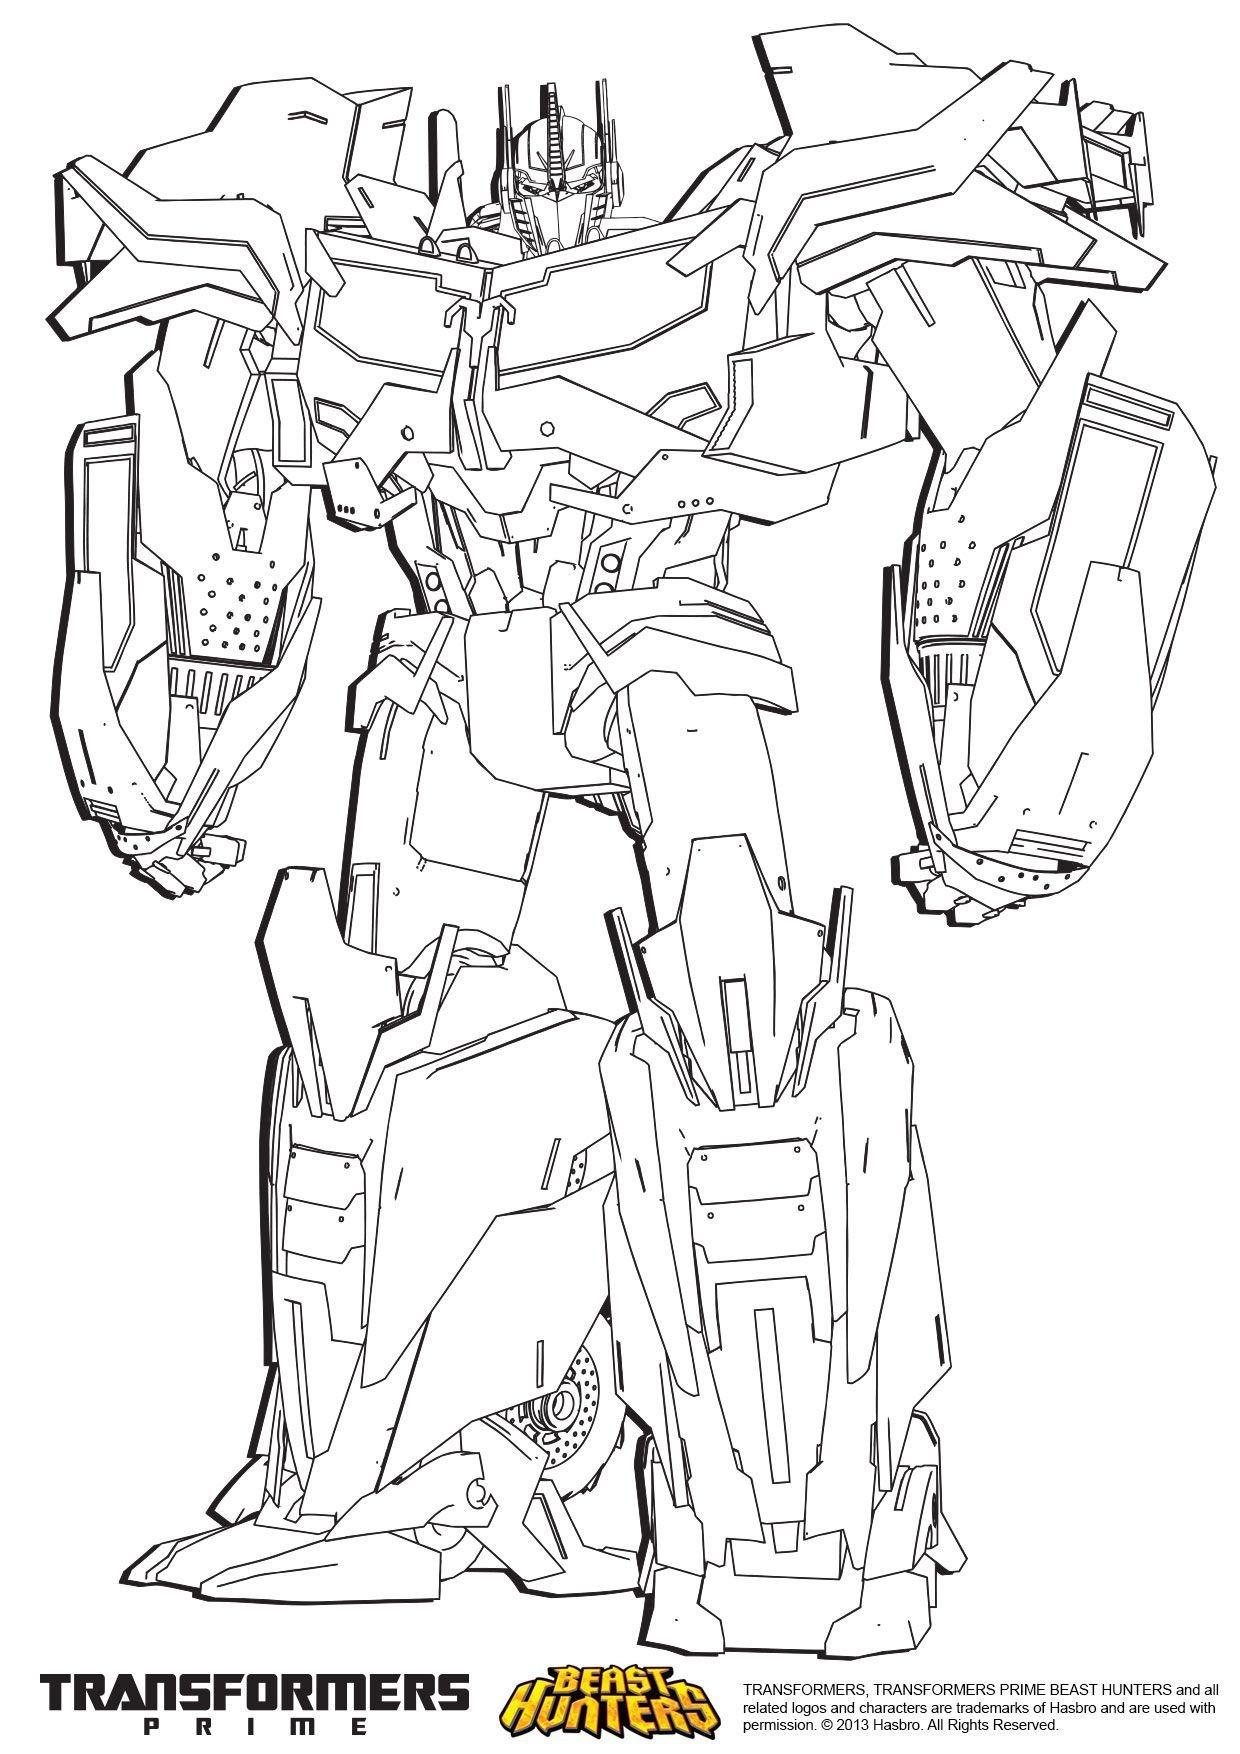 Coloriage Transformers Prime Beast Hunters Optimus Prime Coloriage Transformers Coloriages Dessins Animes